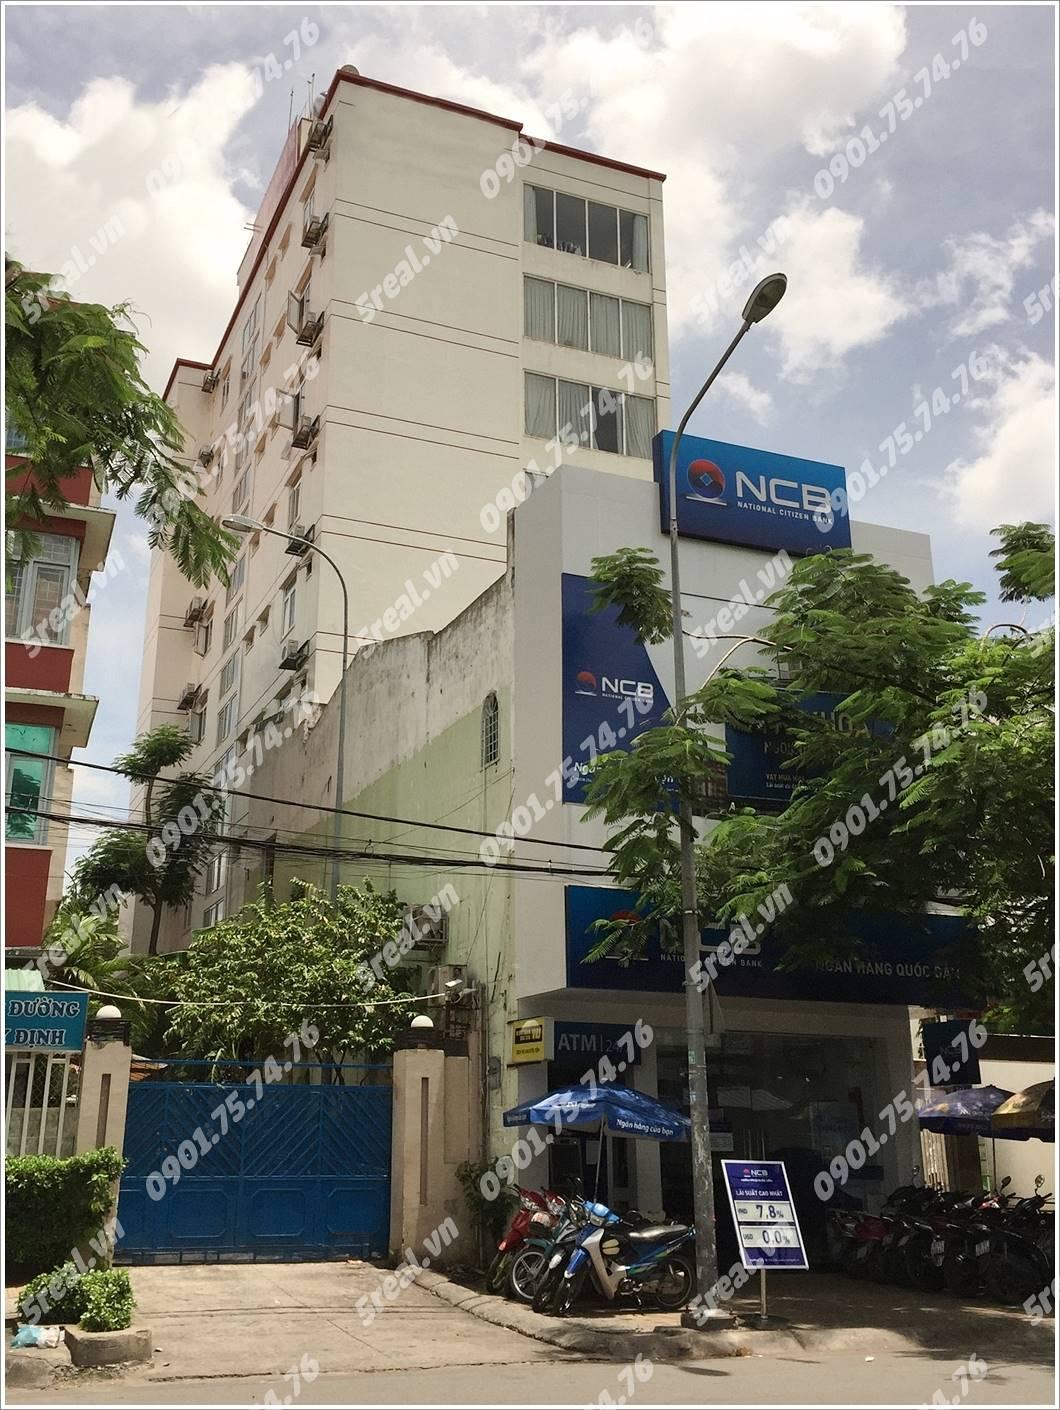 lac-long-quan-building-quan-7-van-phong-cho-thue-5real.vn-01